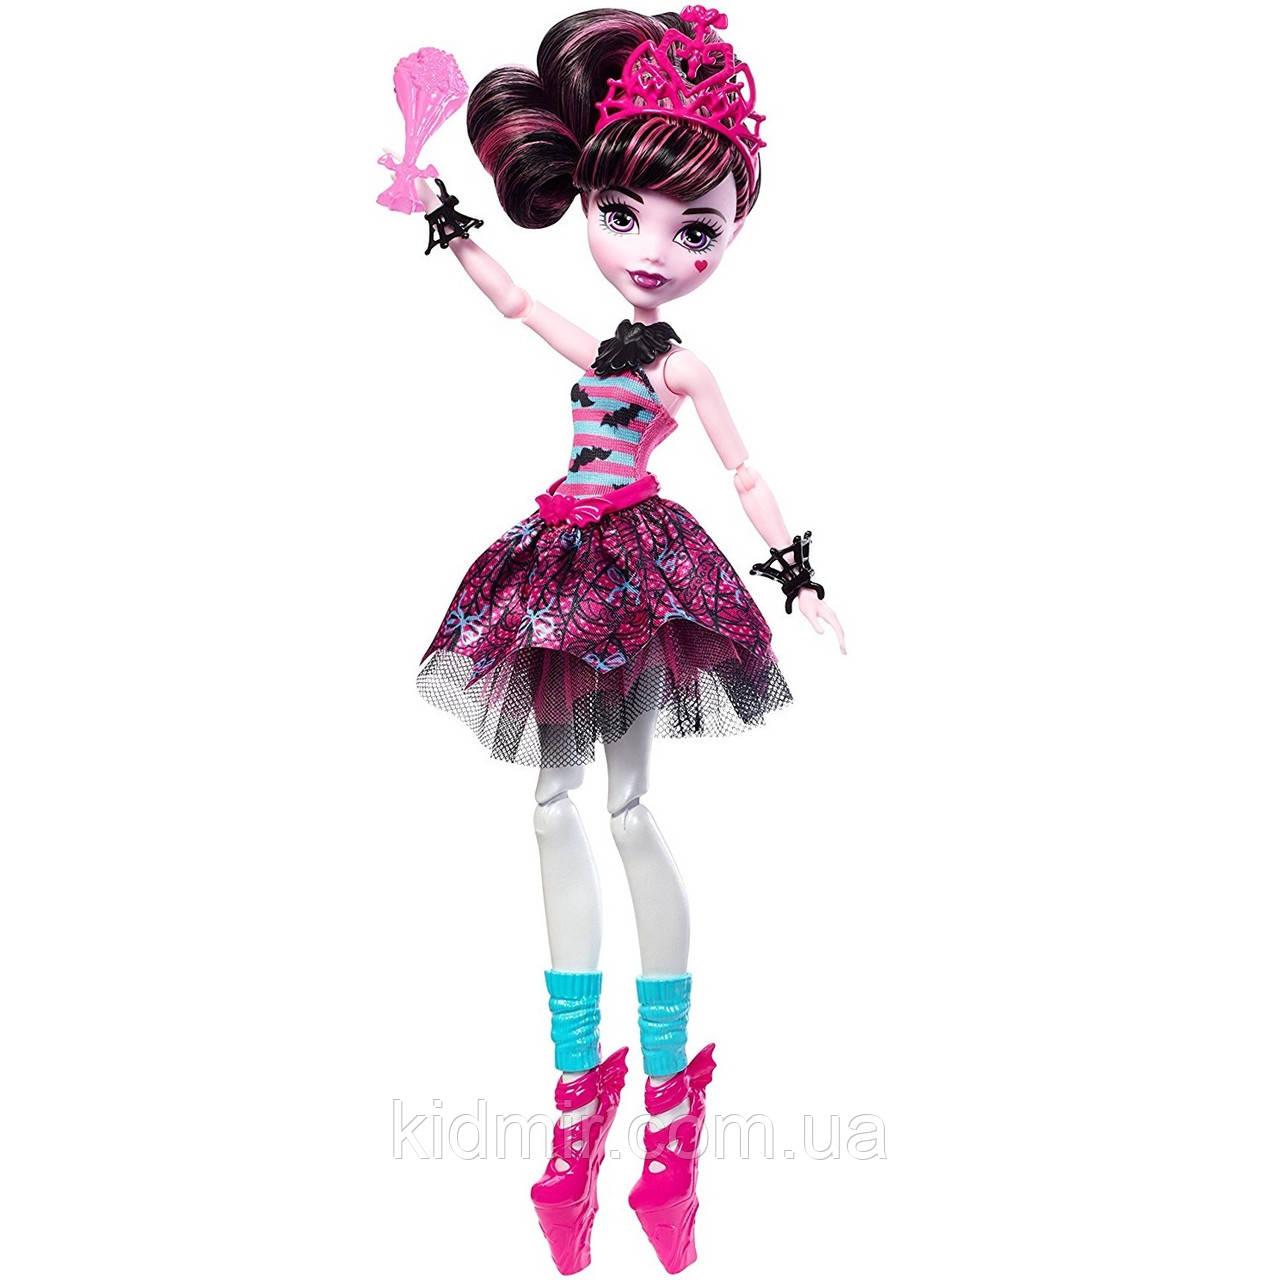 Кукла Monster High Дракулаура (Draculaura) из серии Ballerina Ghouls Монстр Хай